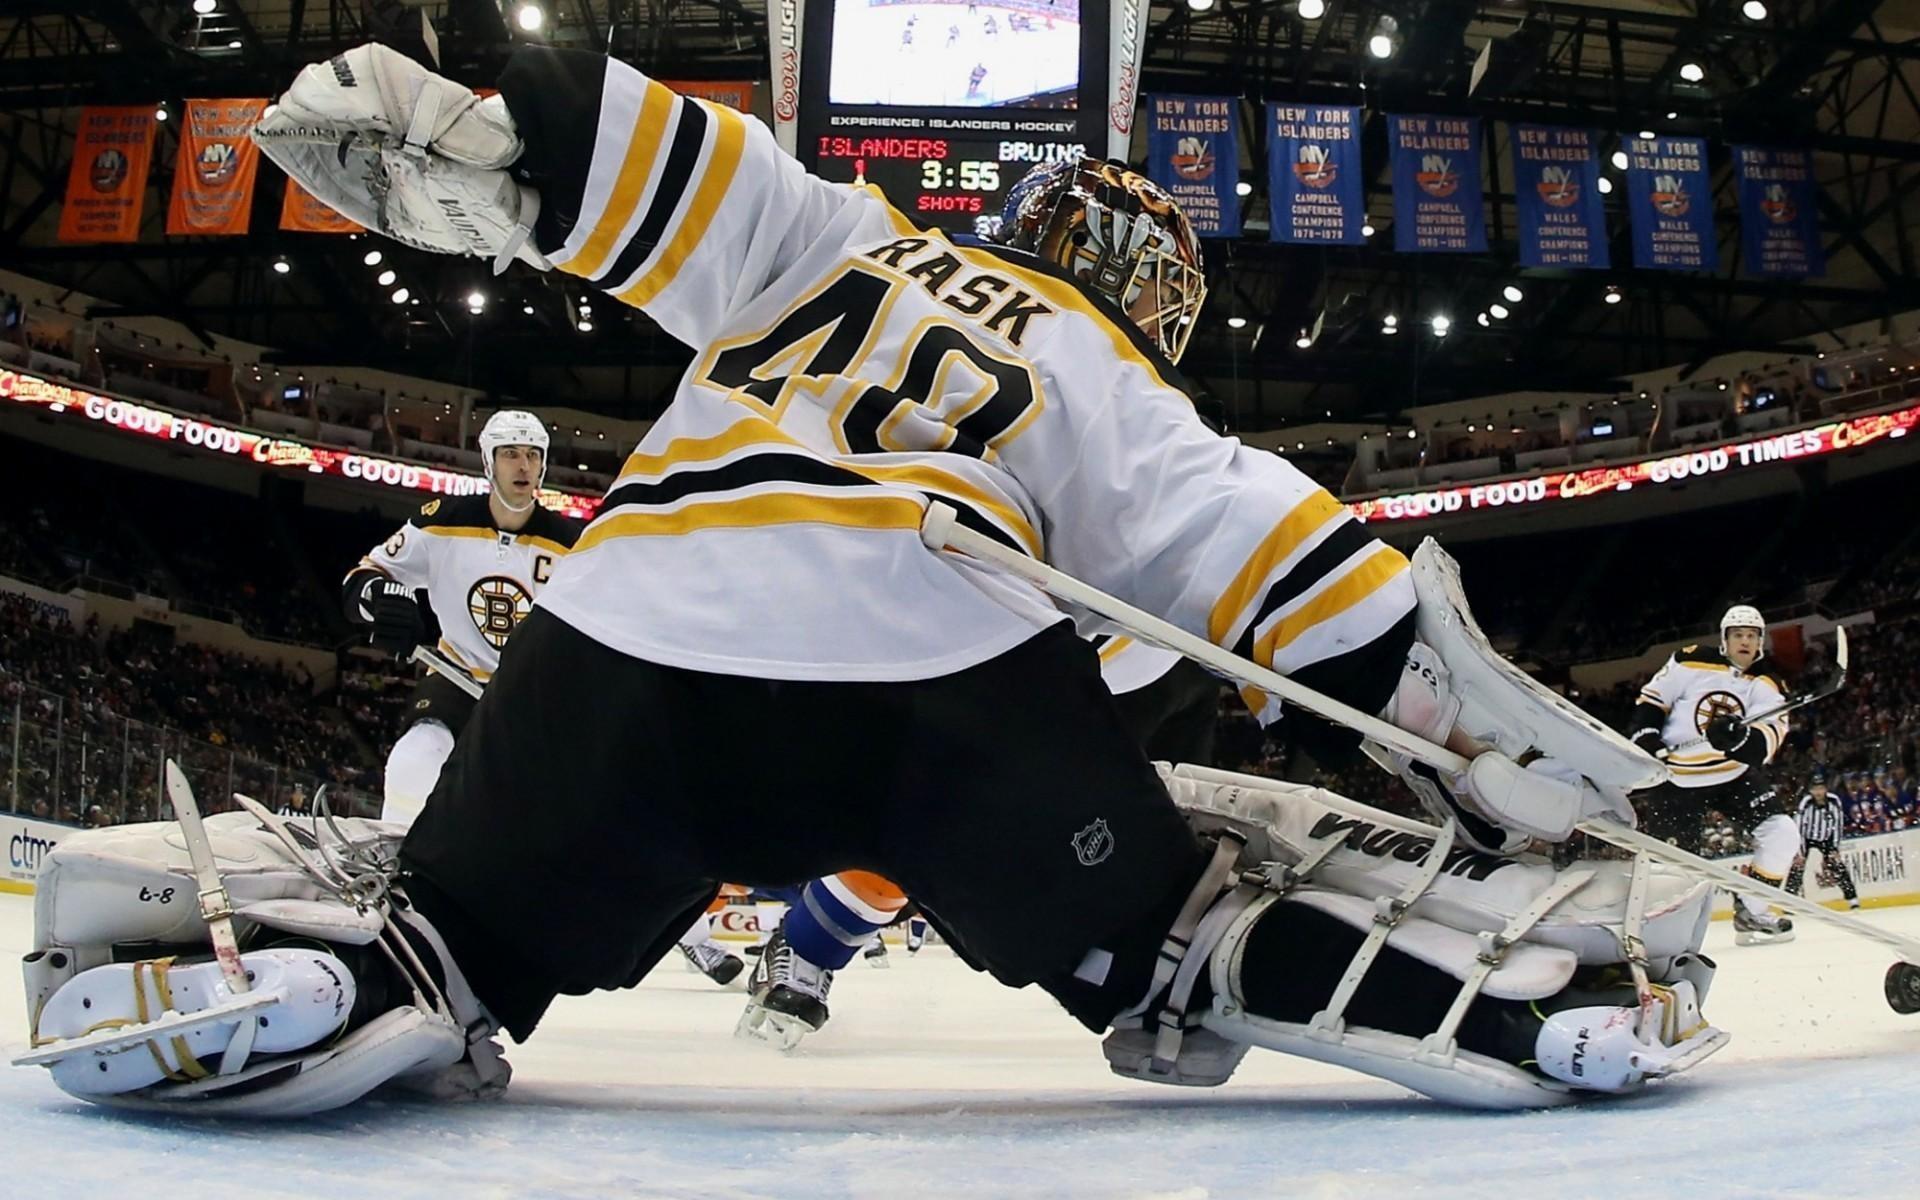 wallpaper.wiki-Download-Free-Boston-Bruins-Background-PIC-